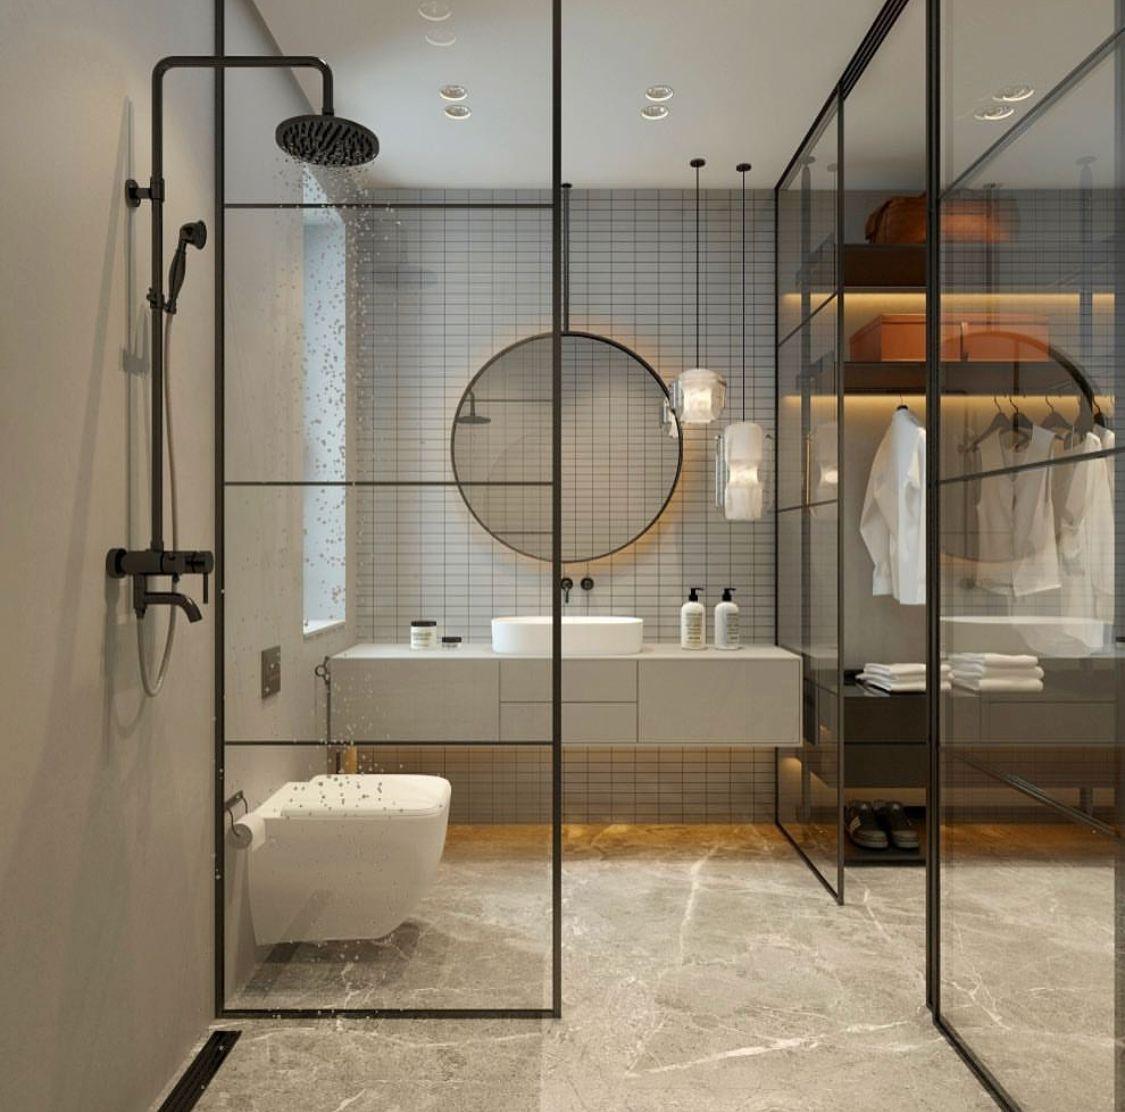 Ensuite badezimmerdesign pin by tern on hhome  pinterest  bathroom modern bathroom and